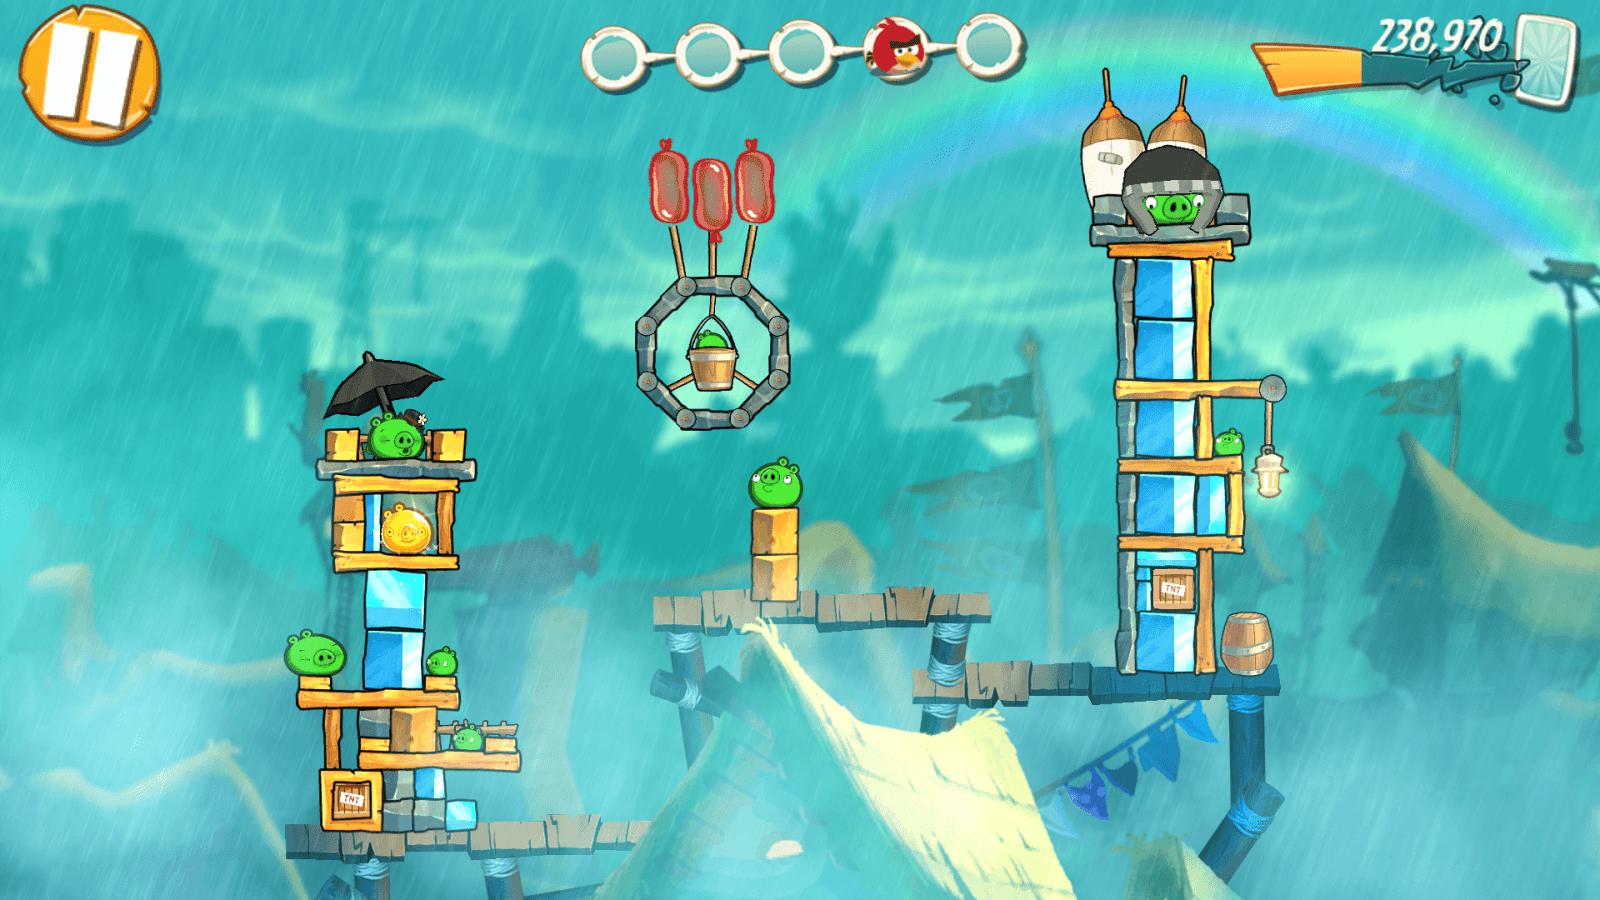 Screenshot 2015 08 19 23 01 38 - Обзор Angry Birds 2